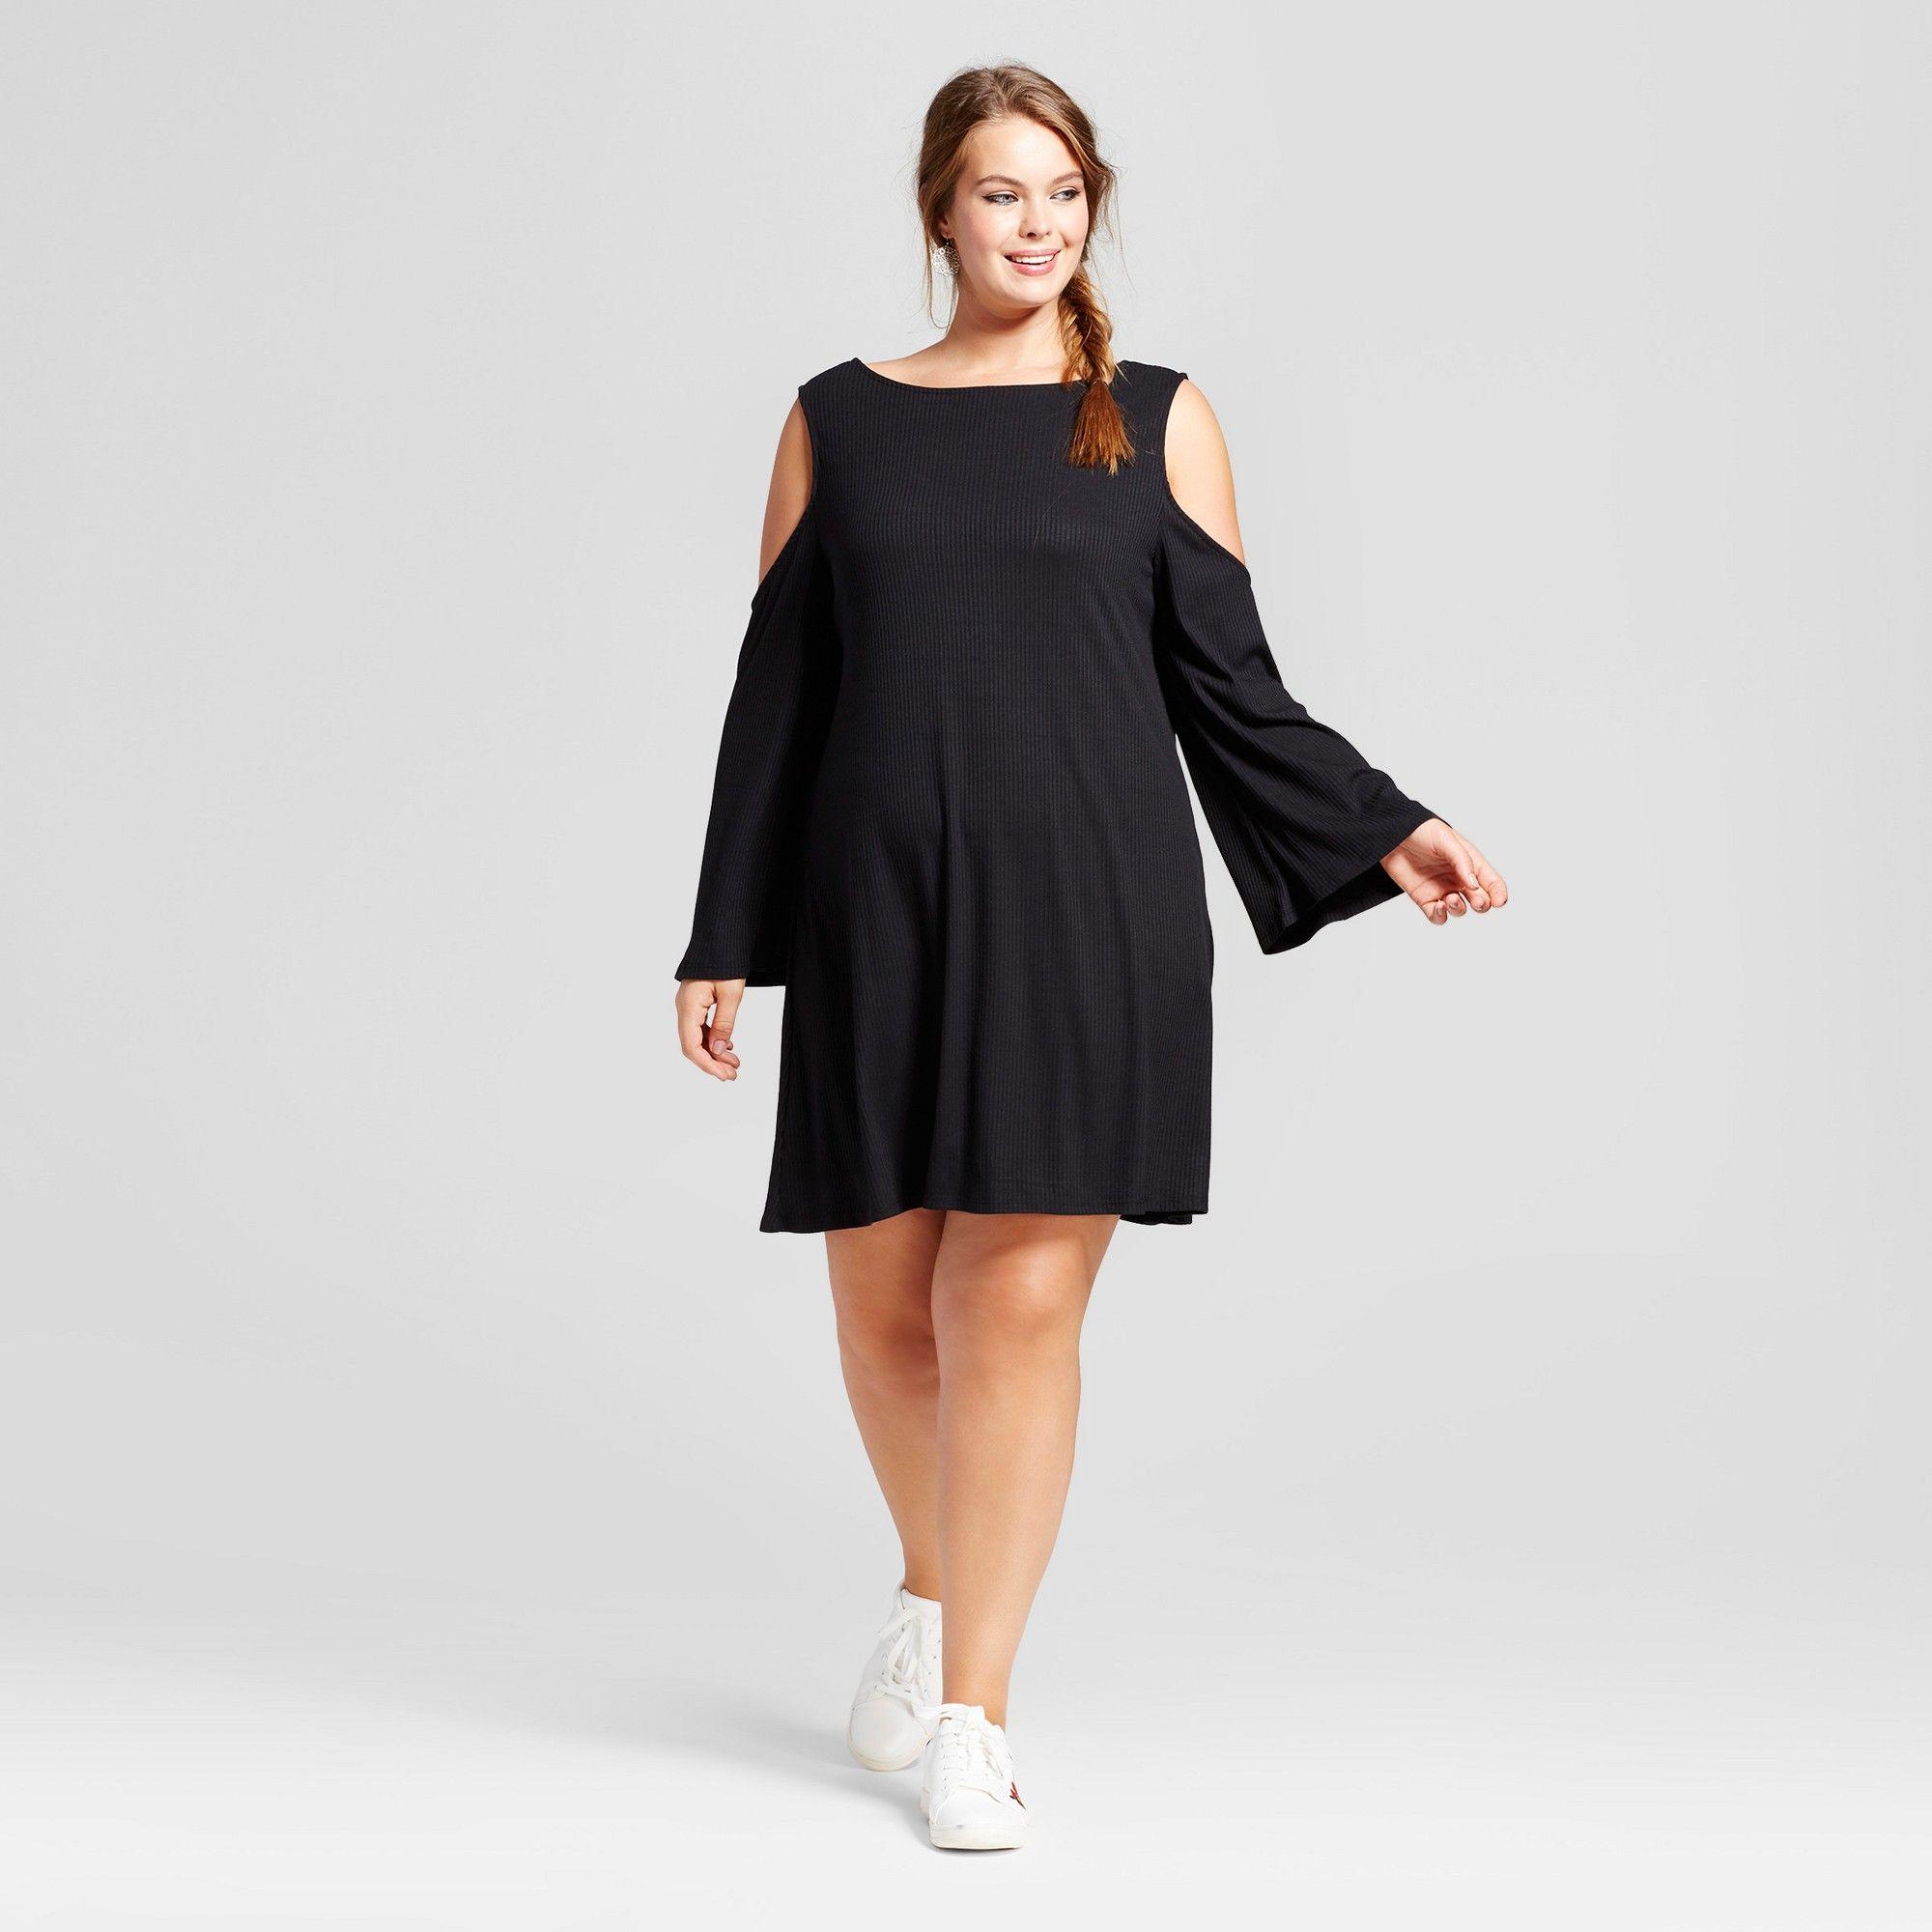 c9a765e754f Women s Plus Size Rib Knit Cold Shoulder Long Sleeve Dress - Xhilaration  Black 3X